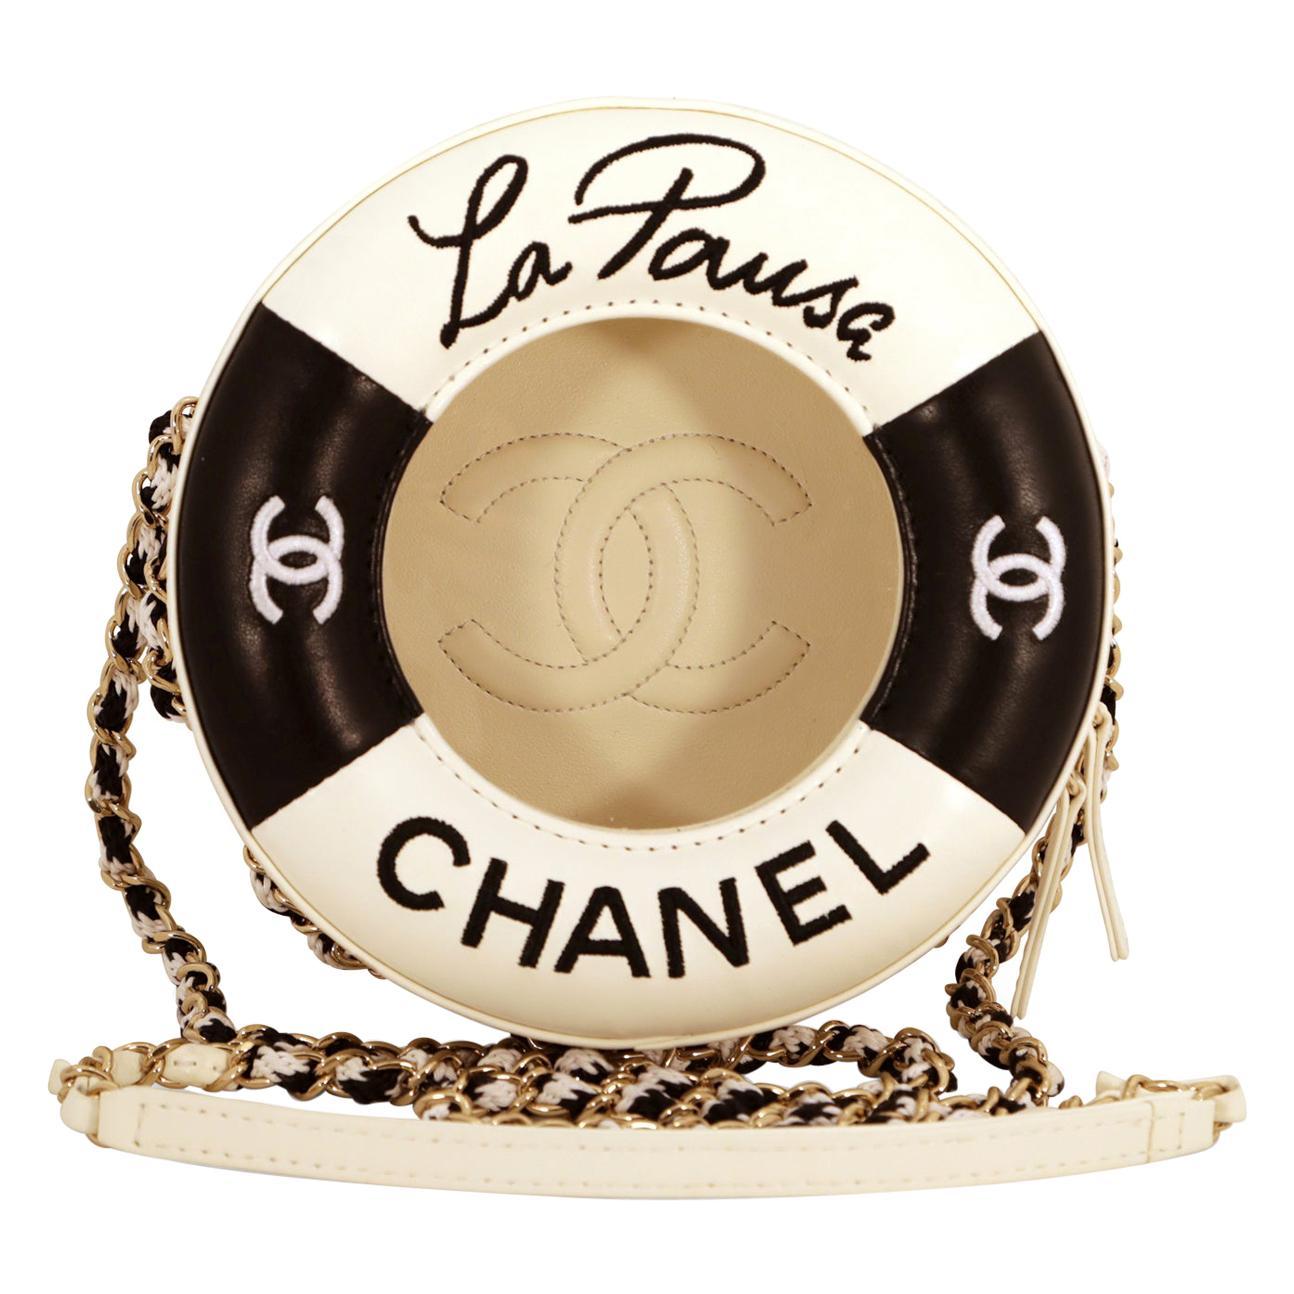 Chanel Black and White La Pausa Life Preserver Bag